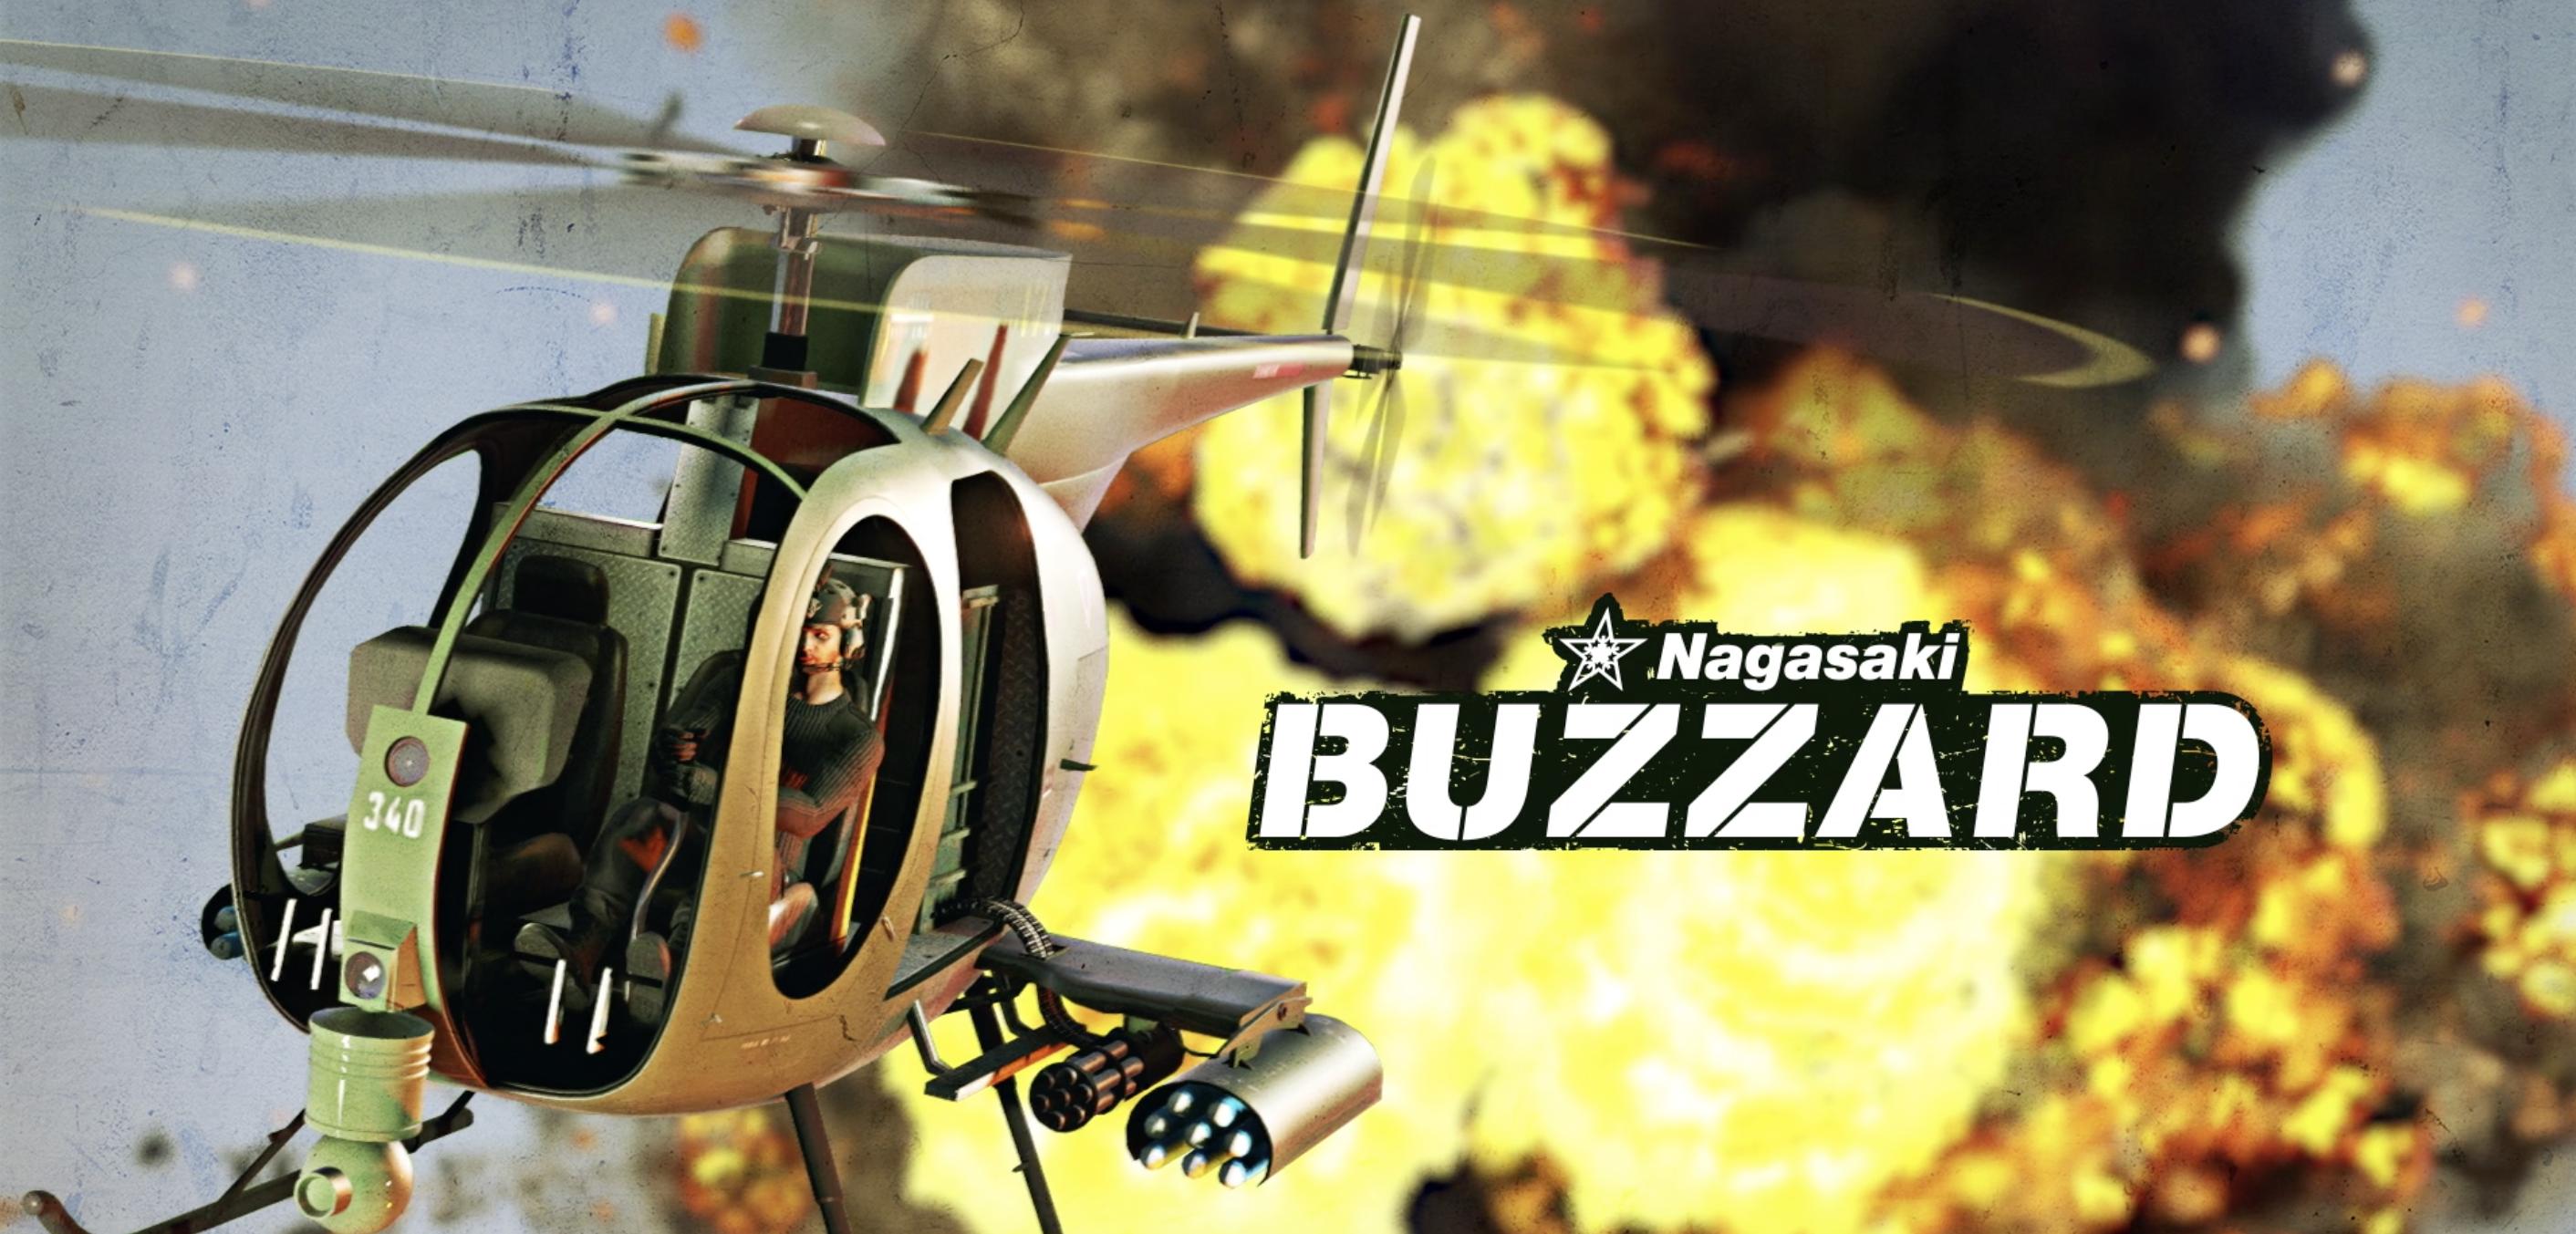 Buzzard 19 Mars 2020